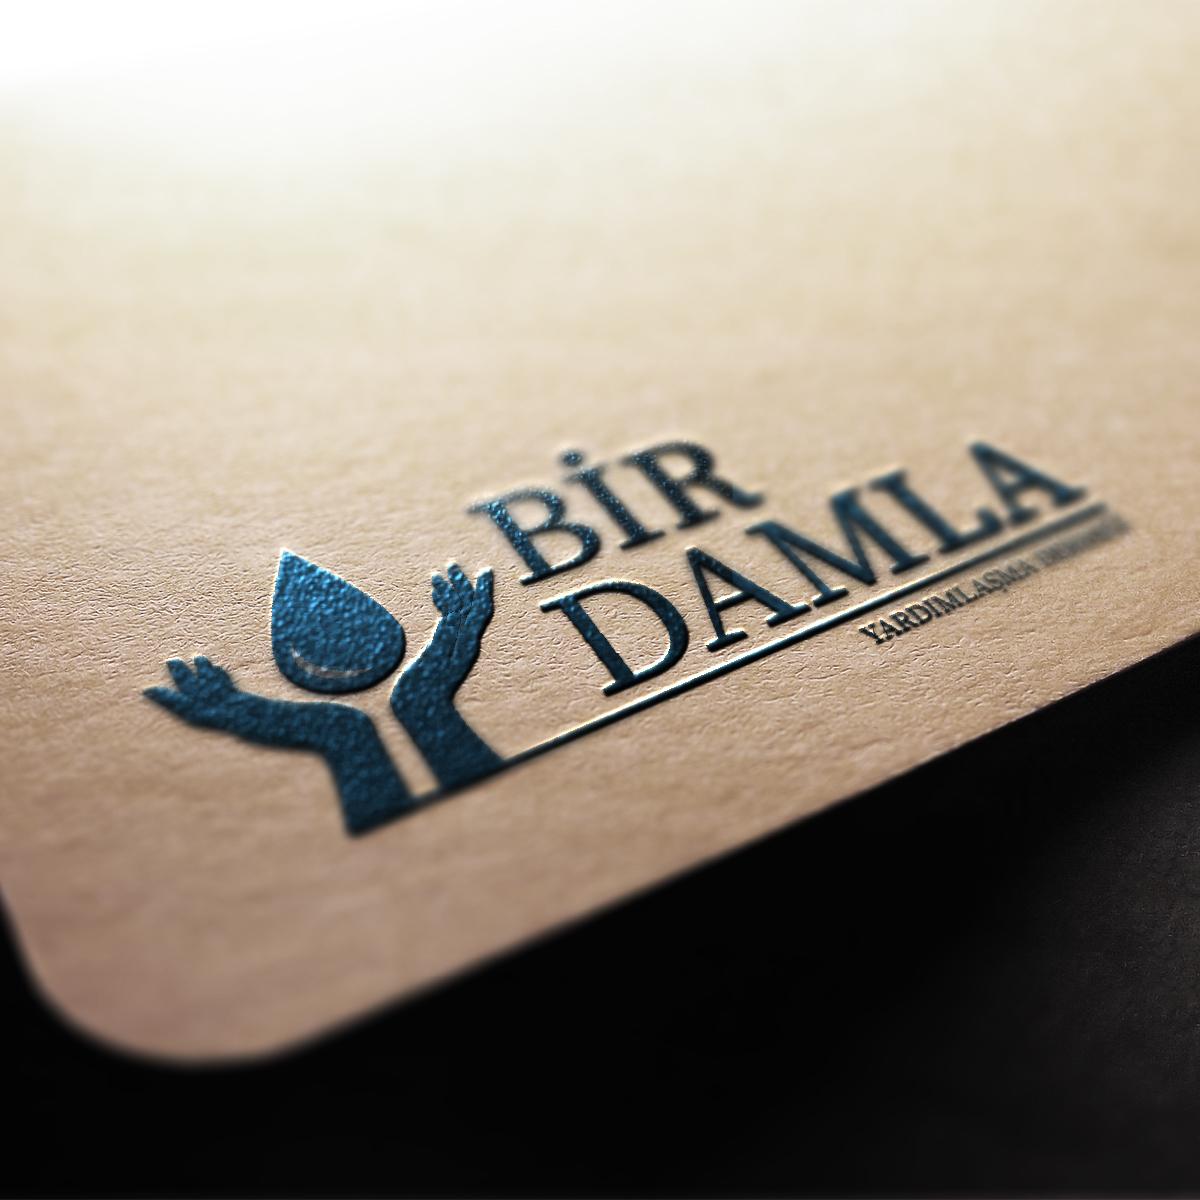 Bir Damla Cooperation Association